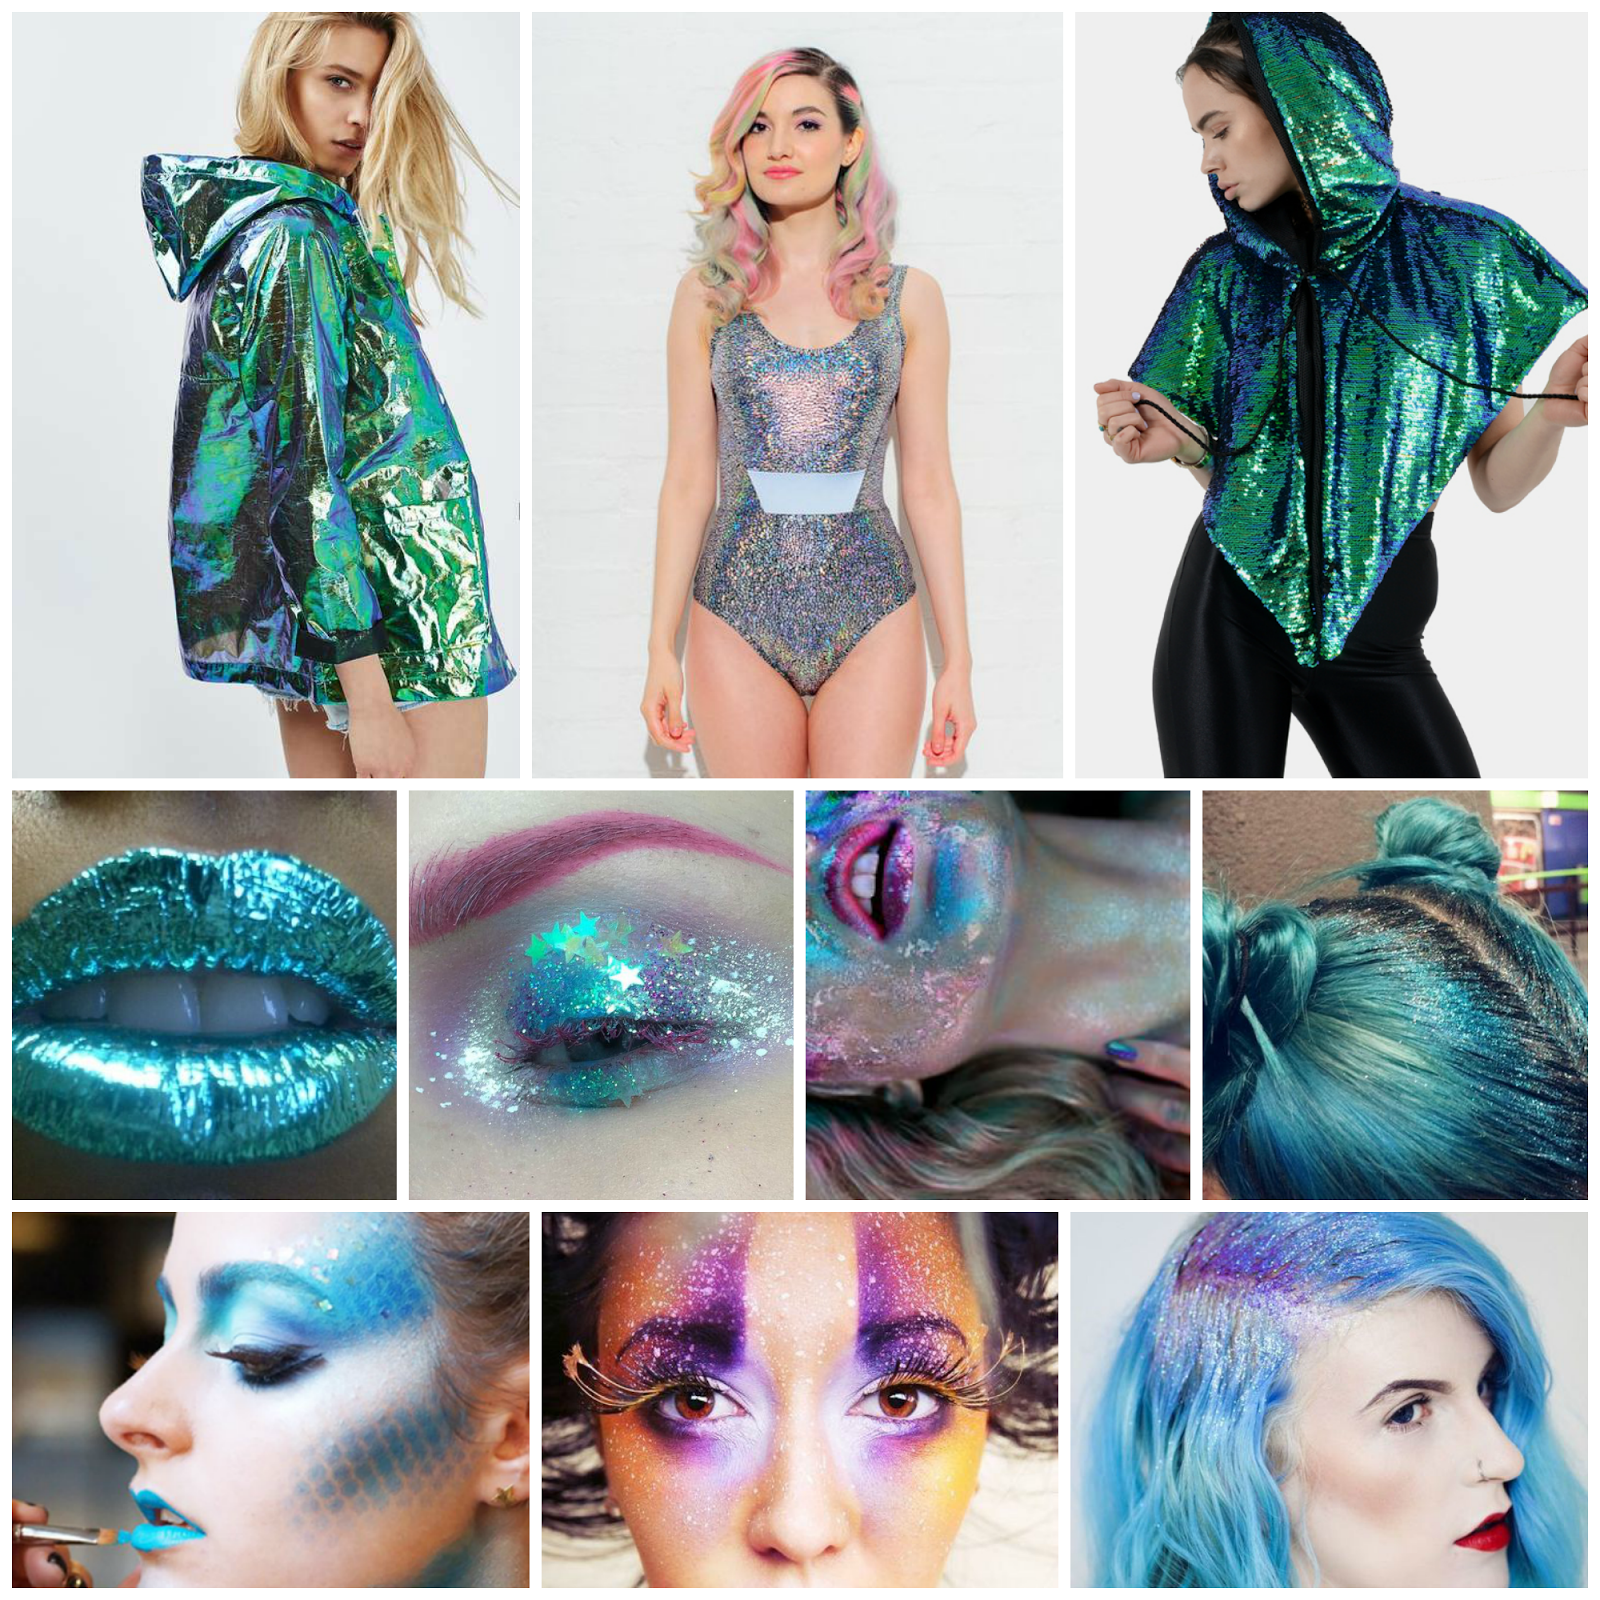 la dulcie vita | festivals, fashion & frolicking.: Outer space Festival Fashion selections ready for Secret Garden Party #fancydress